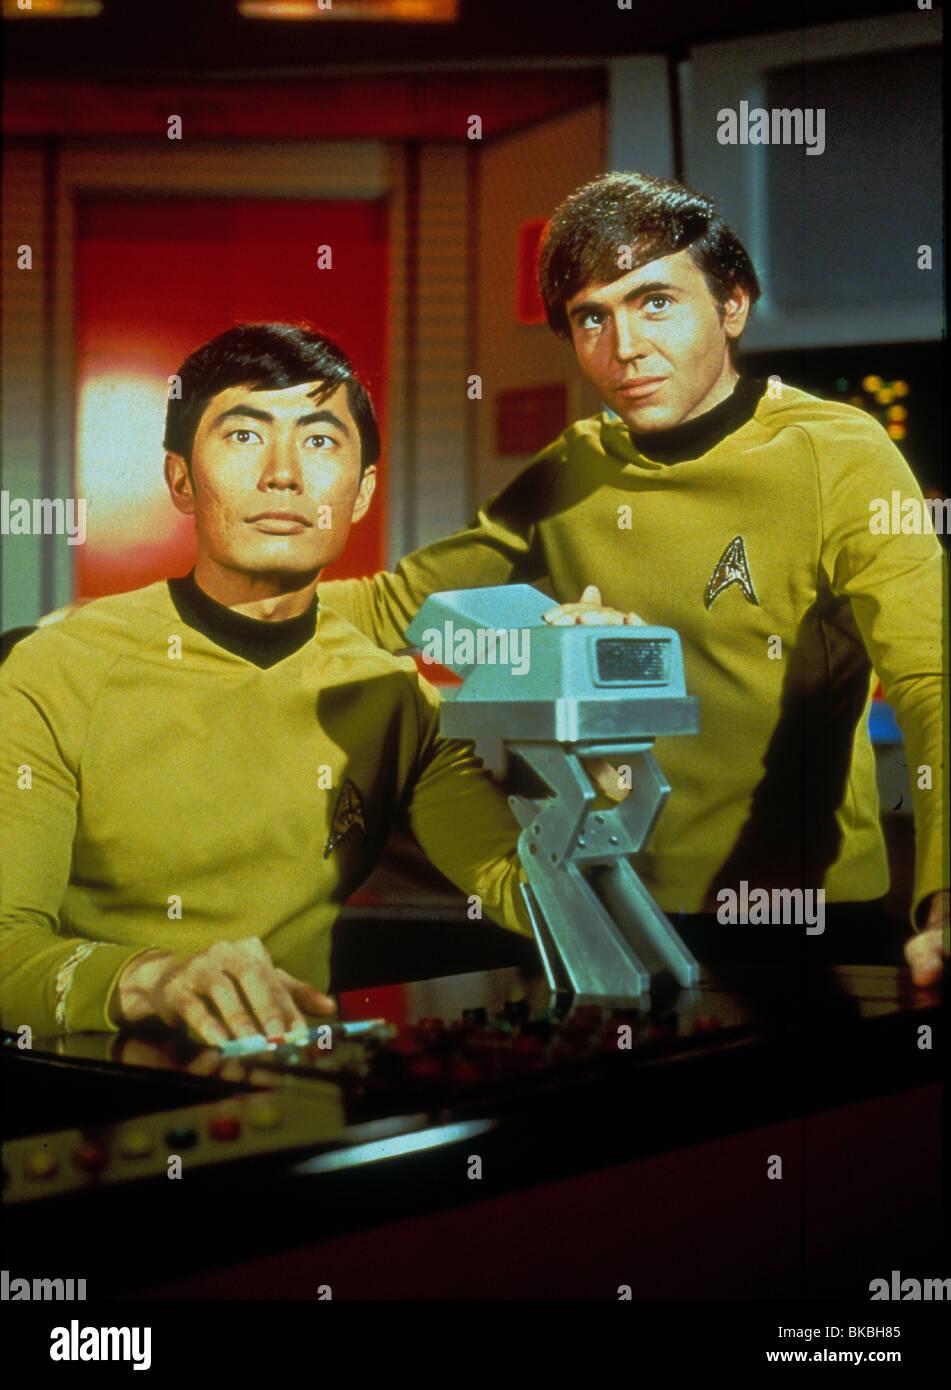 STAR TREK (TV - 1966) GEORGE TAKEI, WALTER KOENIG STK 007 - Stock Image